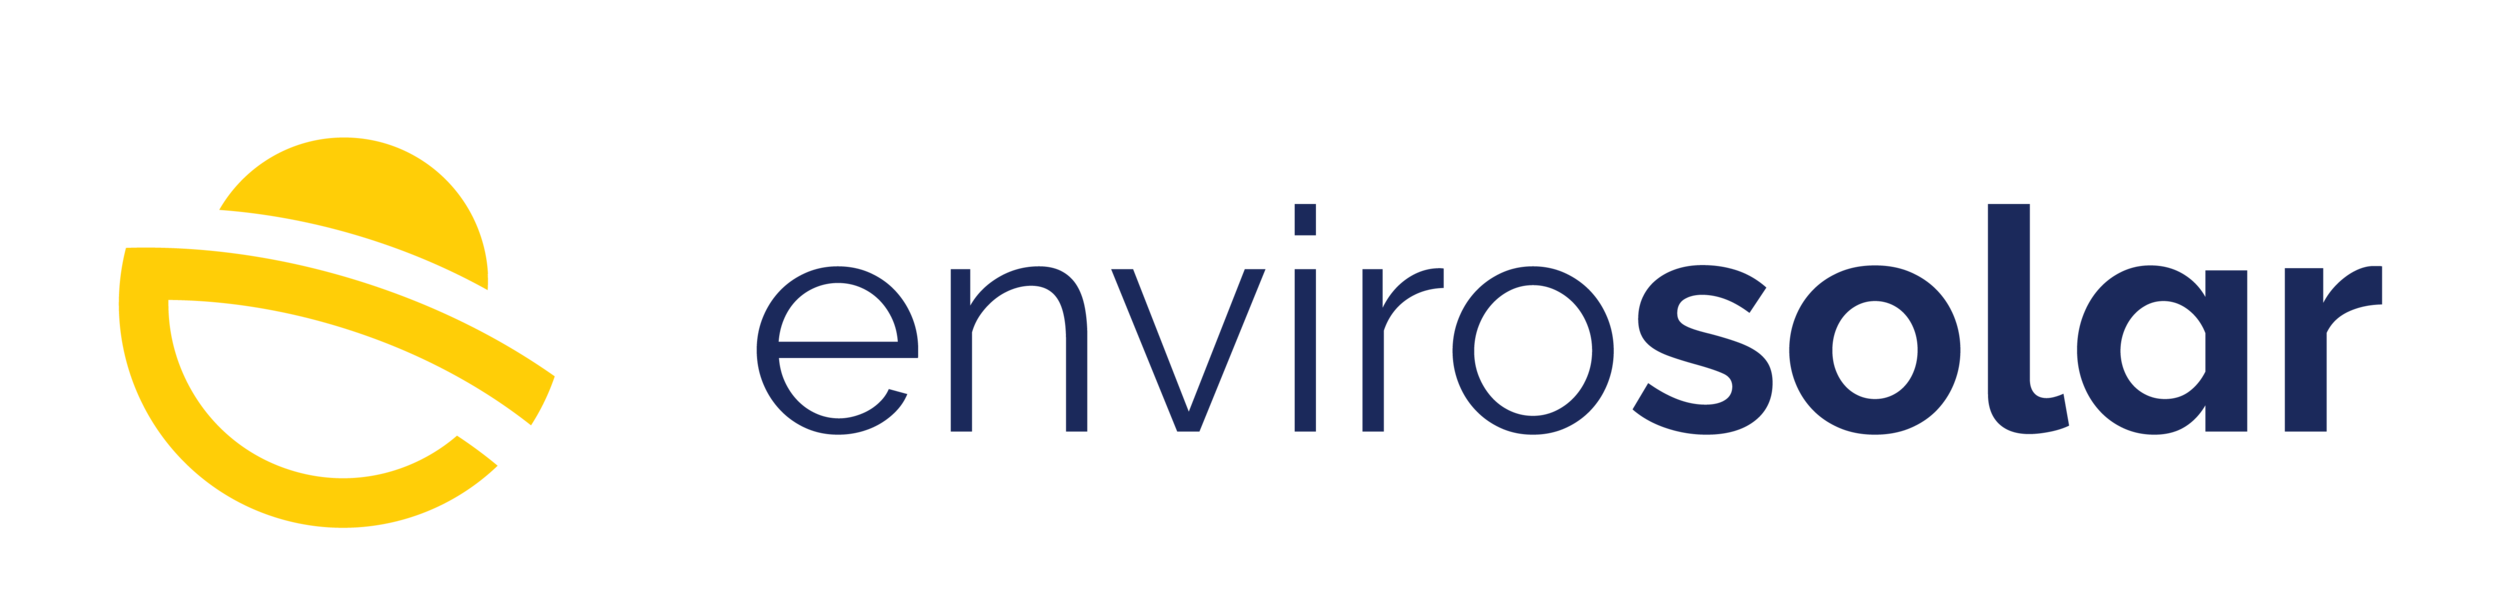 Envirosolar Logo.png